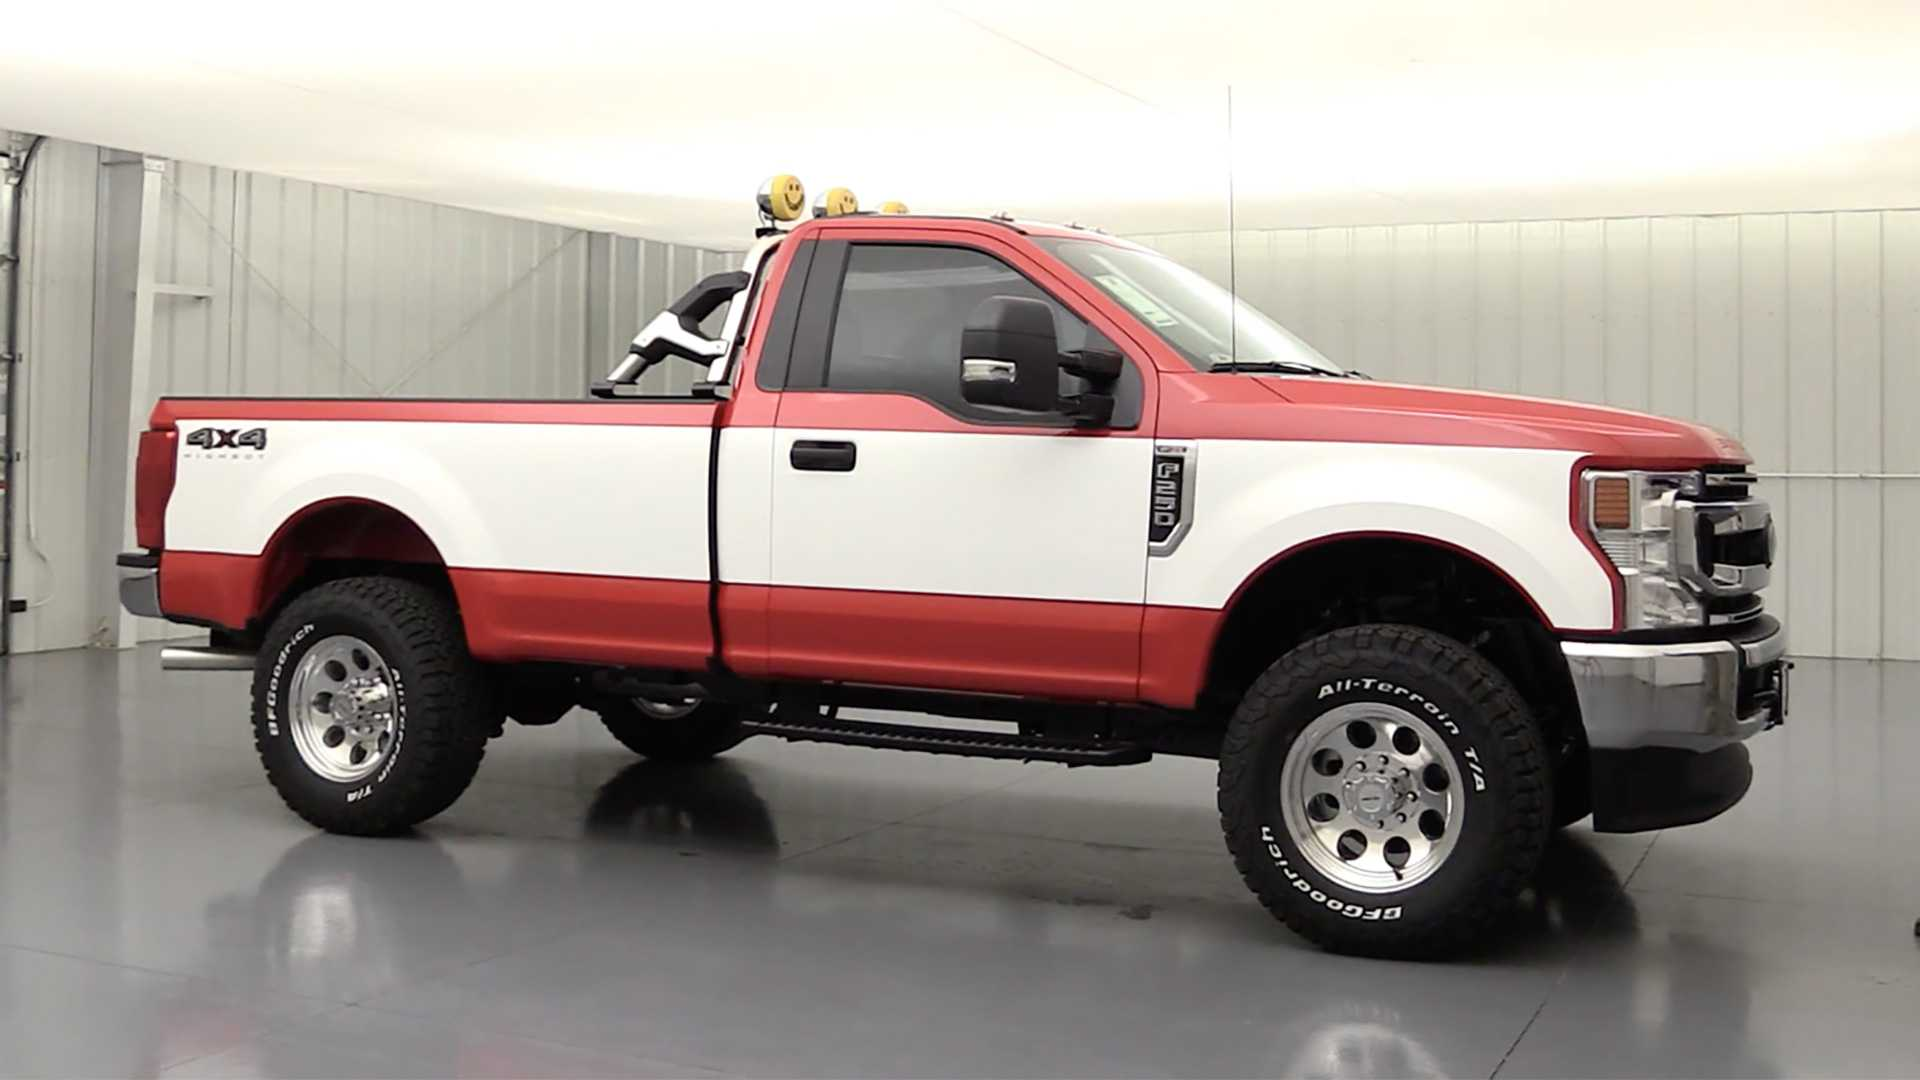 2020 Ford Super Duty Highboy Pack Gives Modern Trucks A Styling Twist